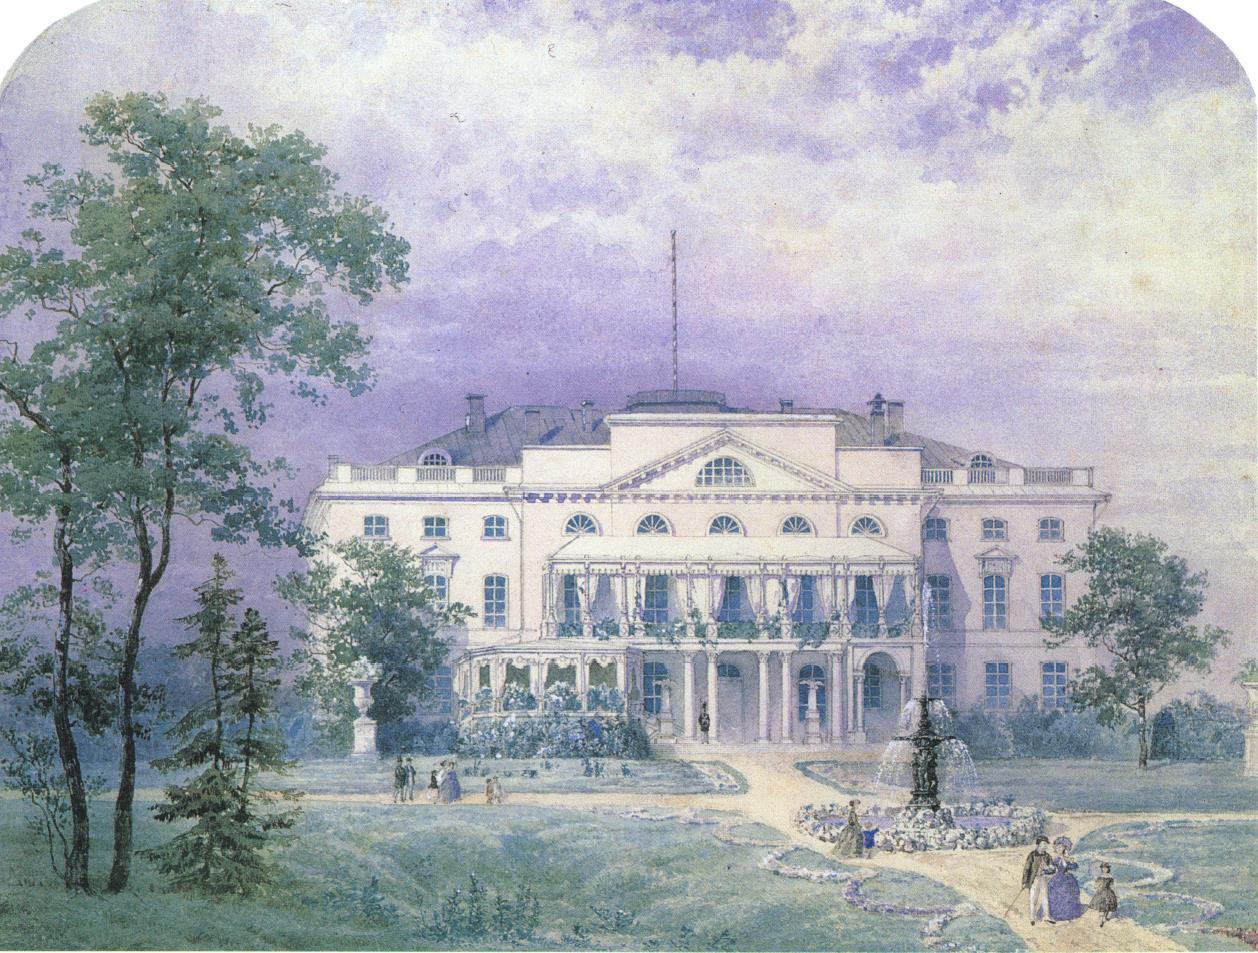 1850-1860-е. Нескучный (Александринский) дворец